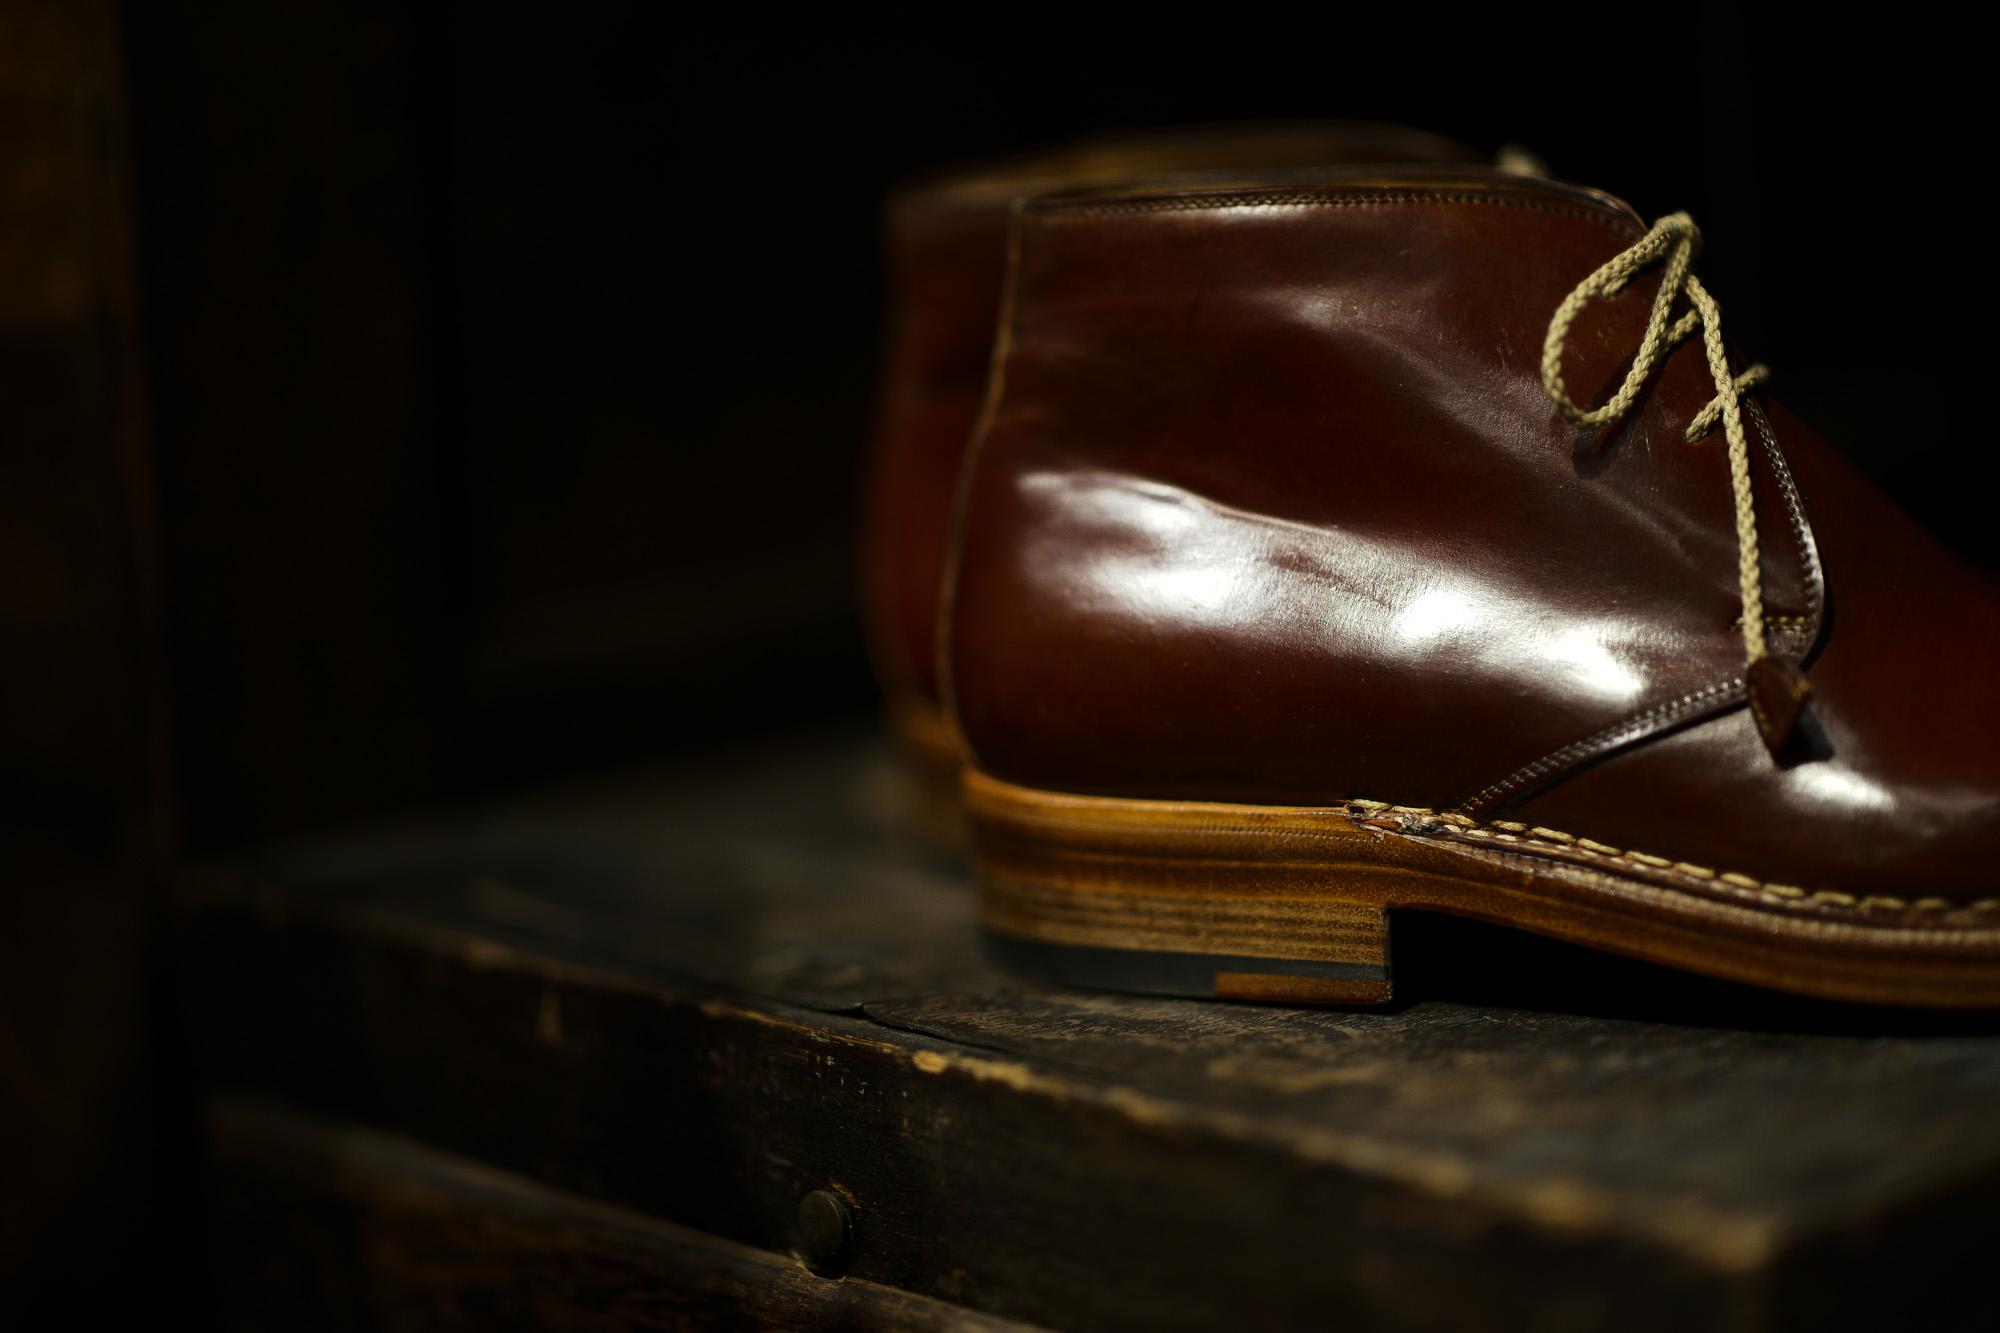 ENZO BONAFE(エンツォボナフェ) ART.3722 Chukka boots チャッカブーツ Horween Shell Cordovan Leather ホーウィン社 シェルコードバンレザー ノルベジェーゼ製法 チャッカブーツ コードバンブーツ No.4(#4)  made in italy (イタリア製) 2019 春夏新作 【Special Model】enzobonafe 愛知 名古屋 altoediritto アルトエデリット